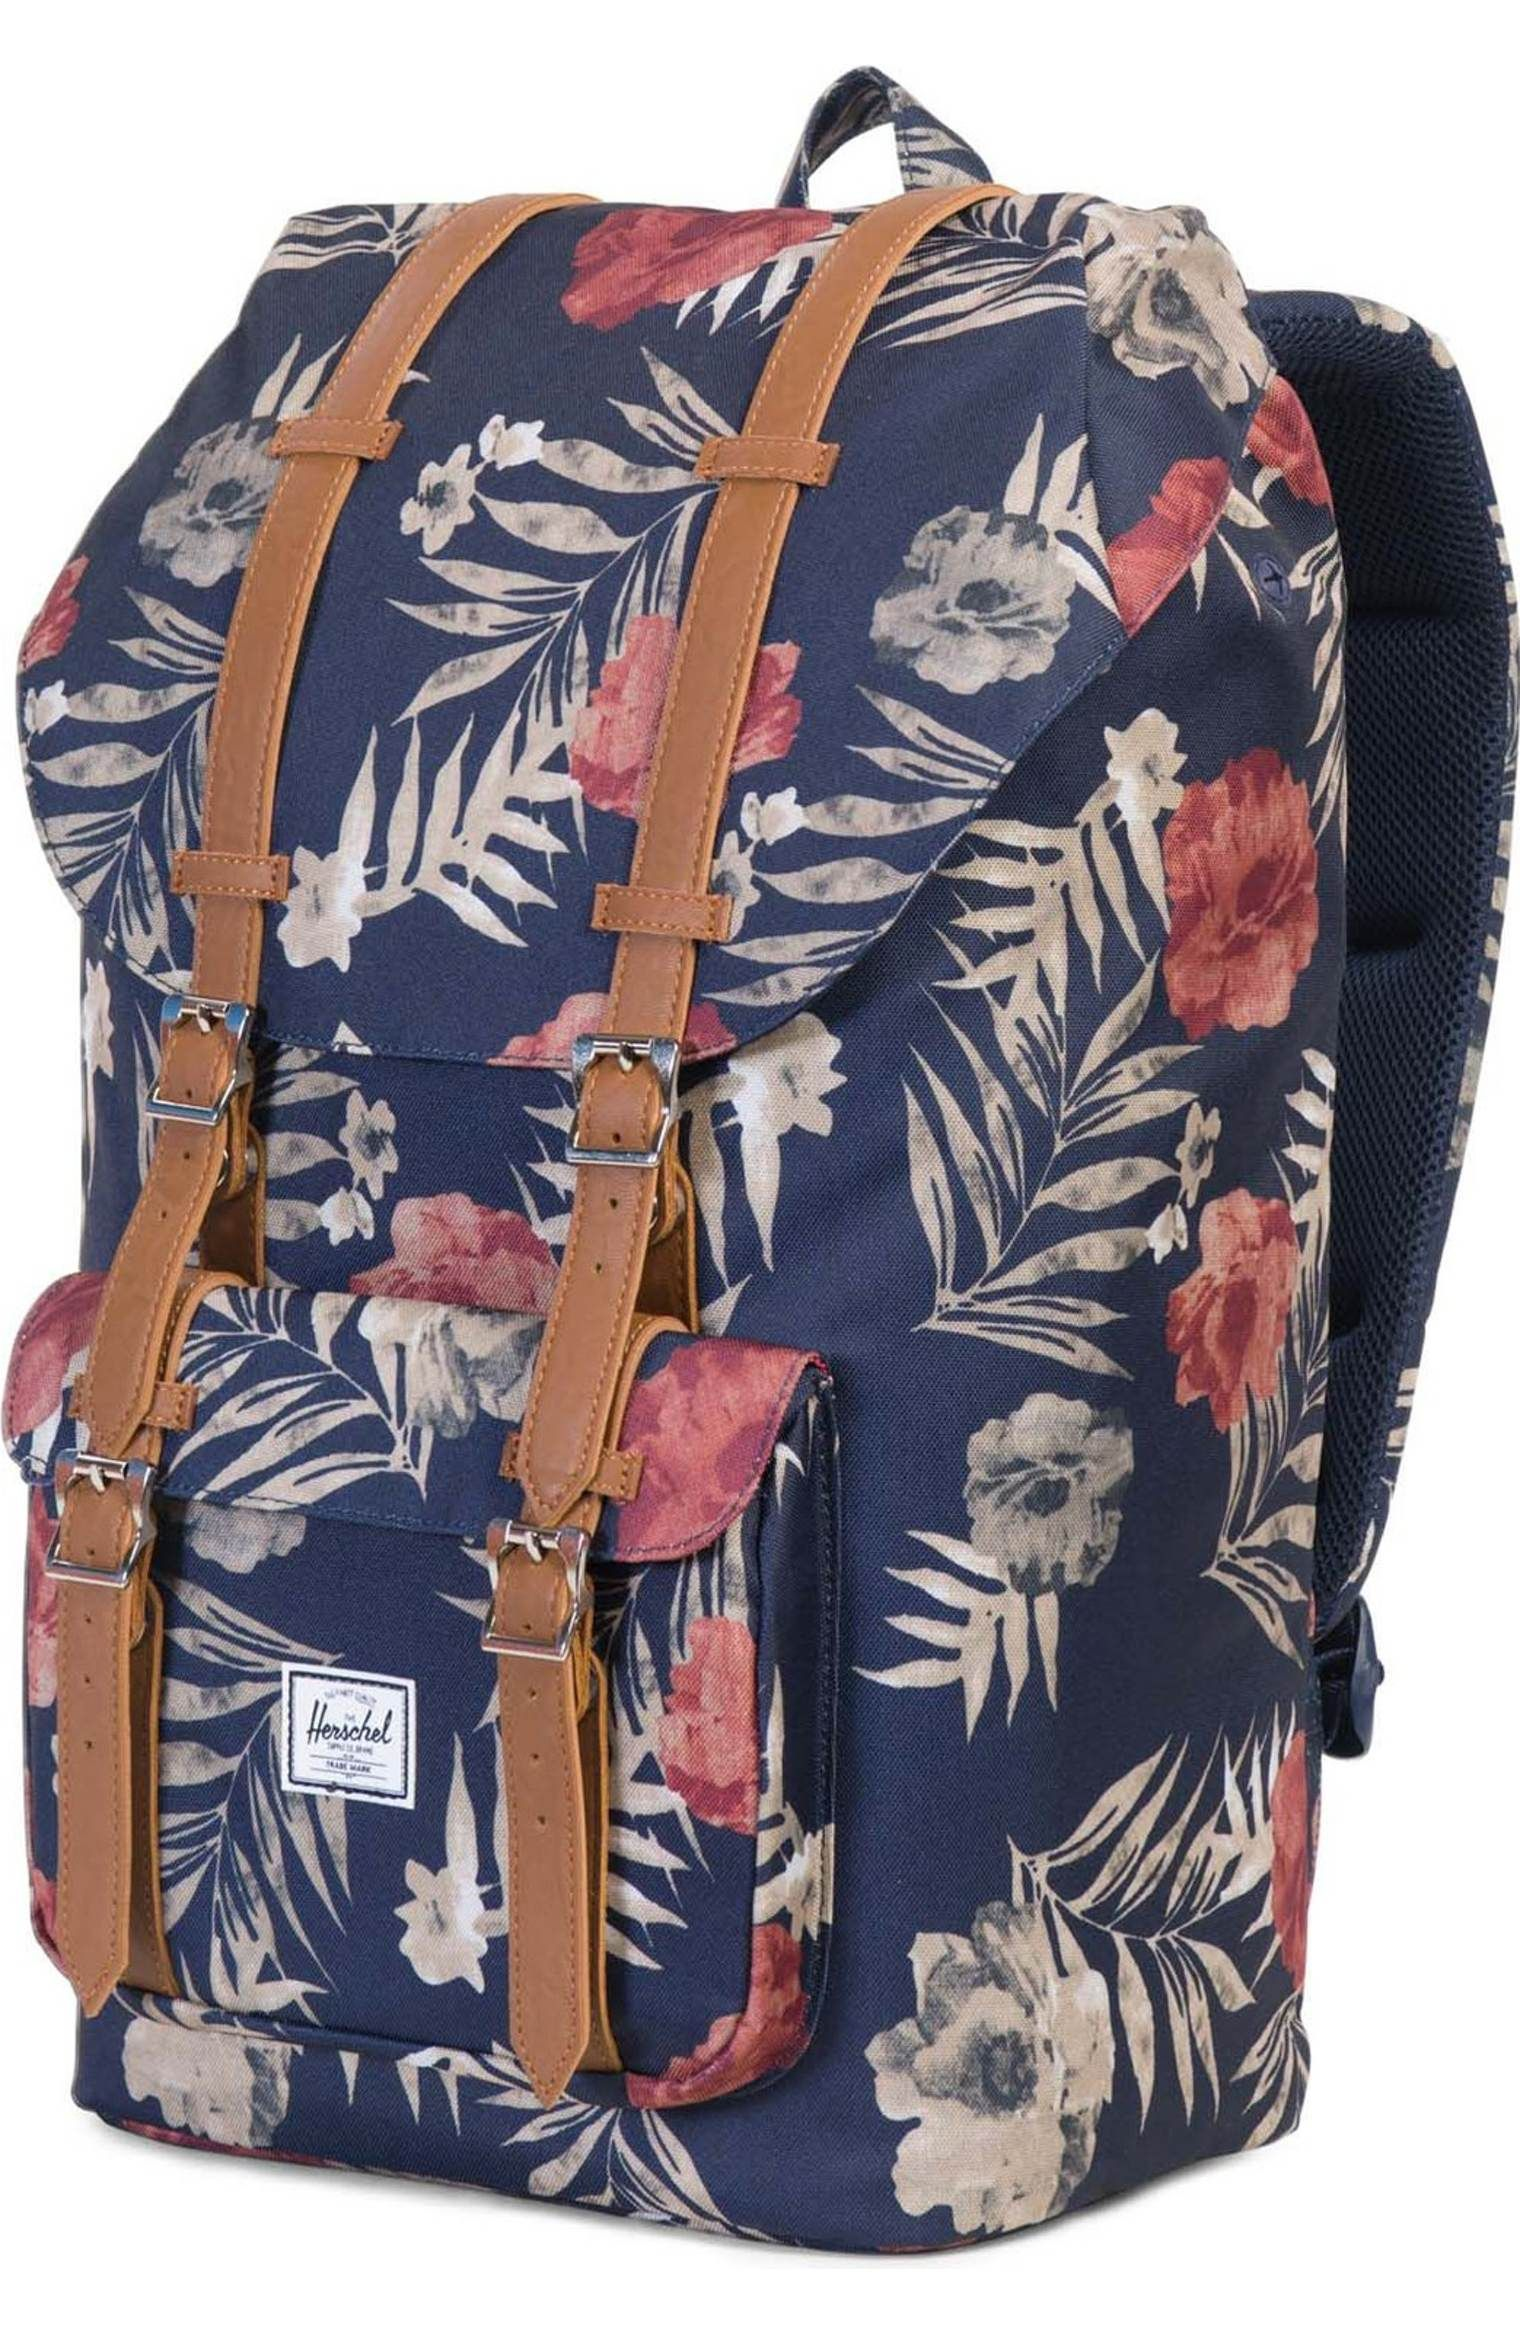 61d00f633a8 Herschel Supply Co. Little America Backpack